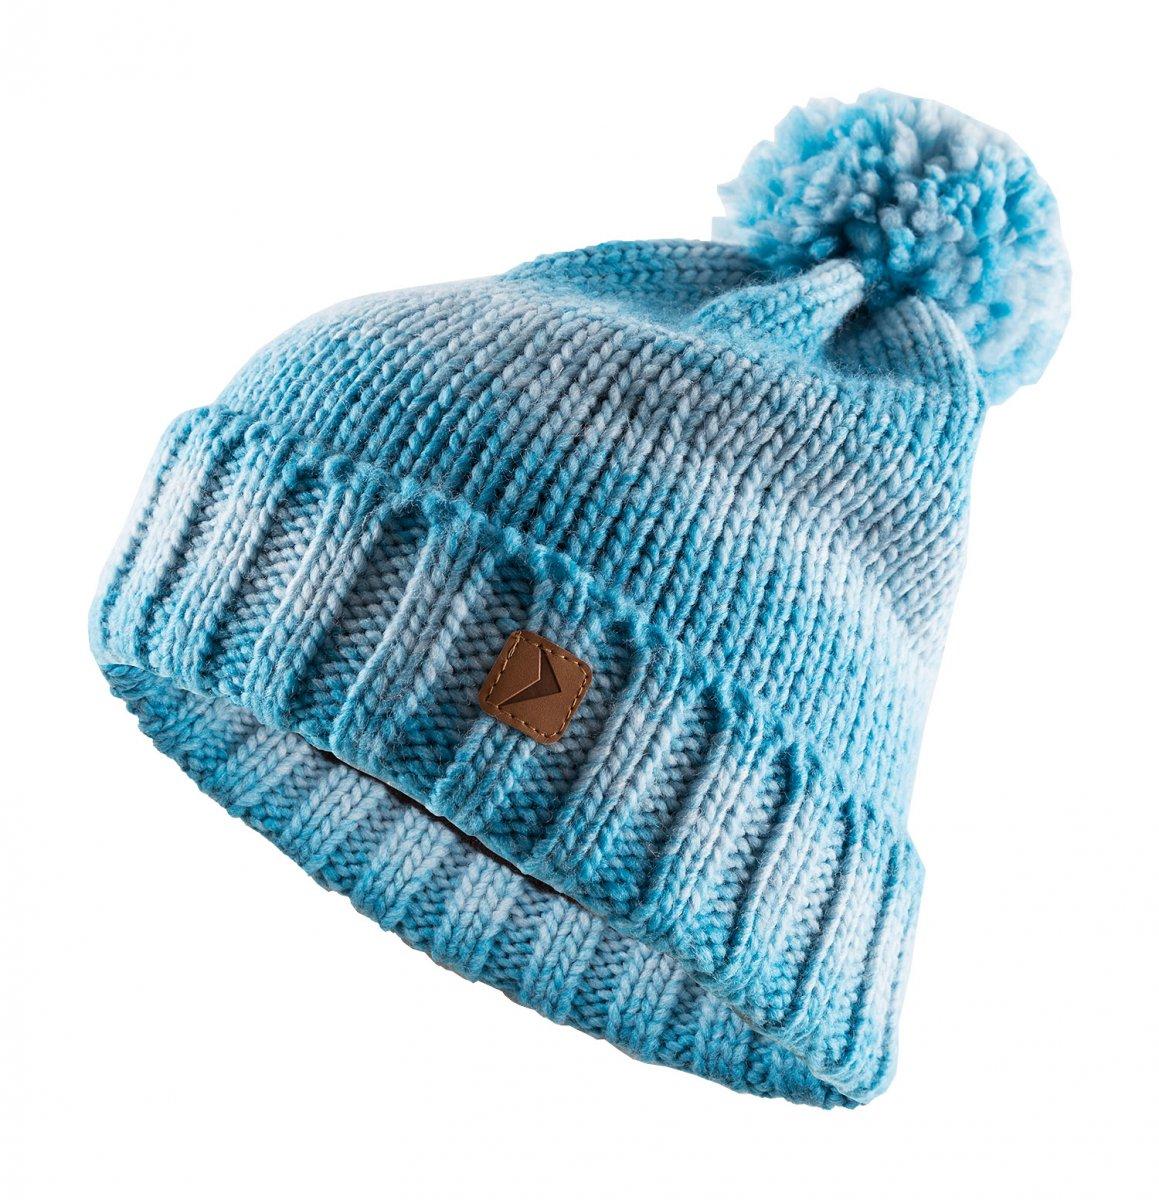 ▷ Купить лыжная одежда Outhorn с EK.ua - все цены интернет ... 2e48fef61e8